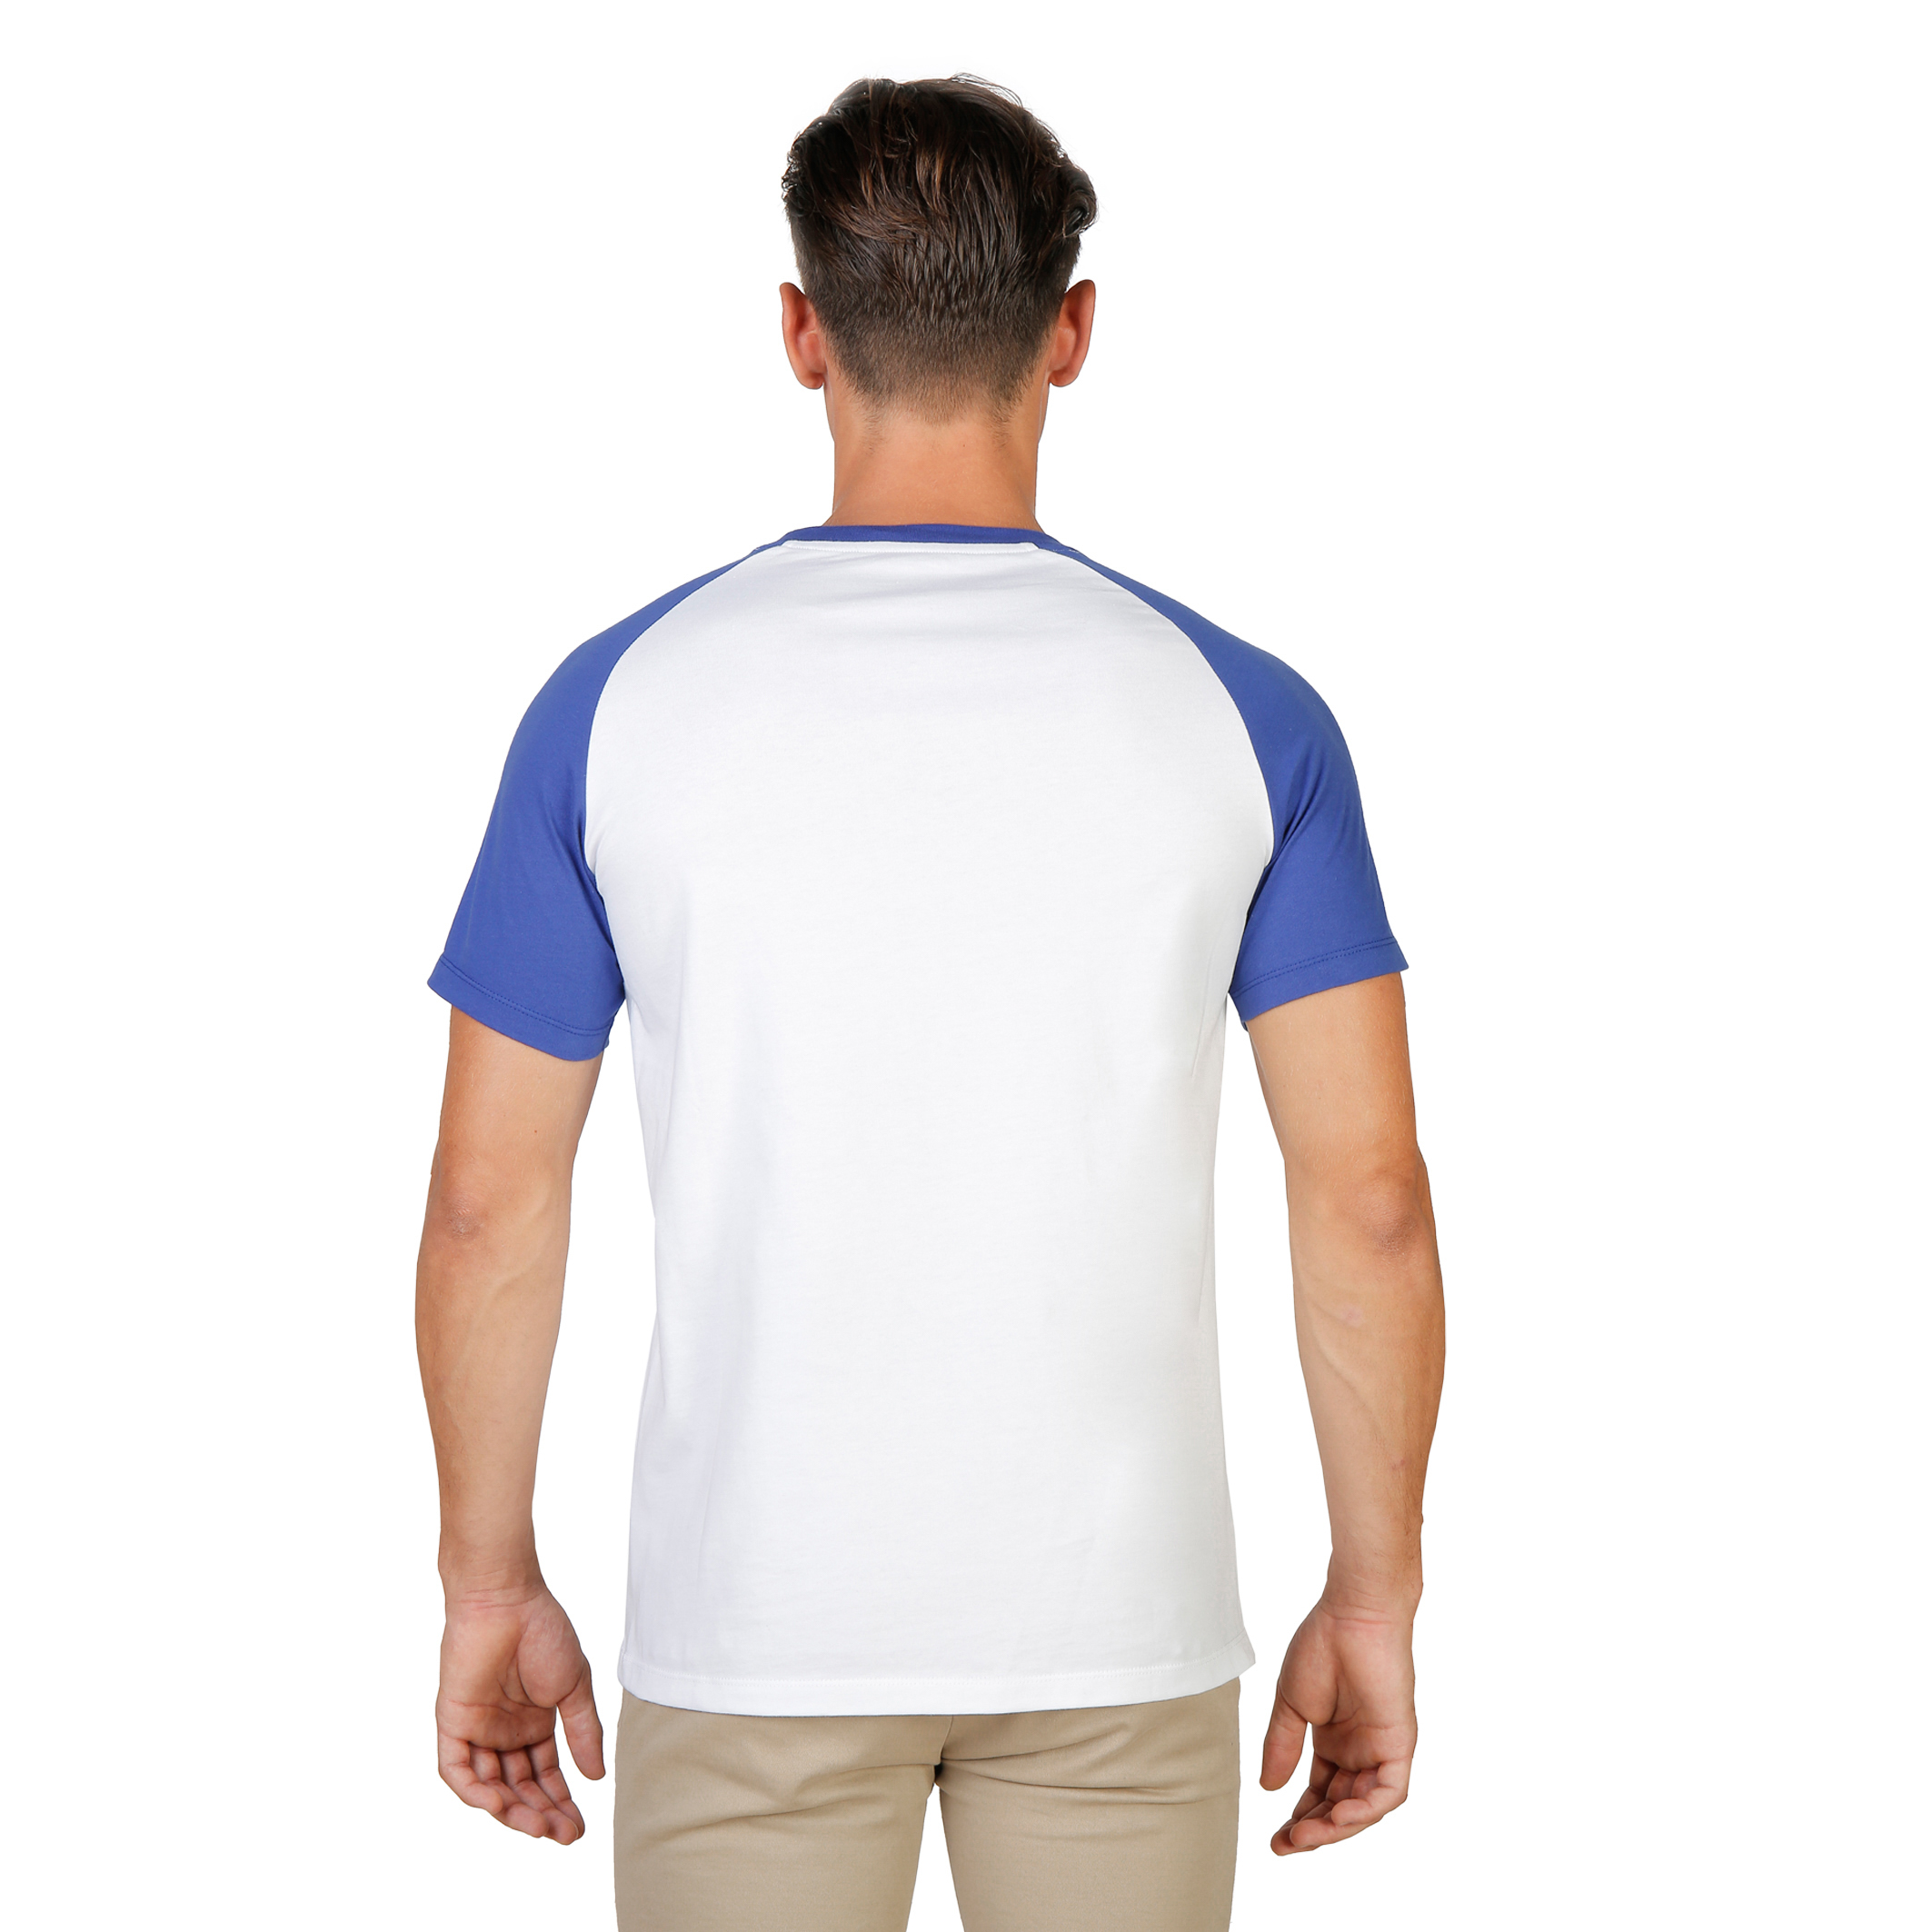 Tee-shirts  Oxford University TRINITY-RAGLAN-MM blue